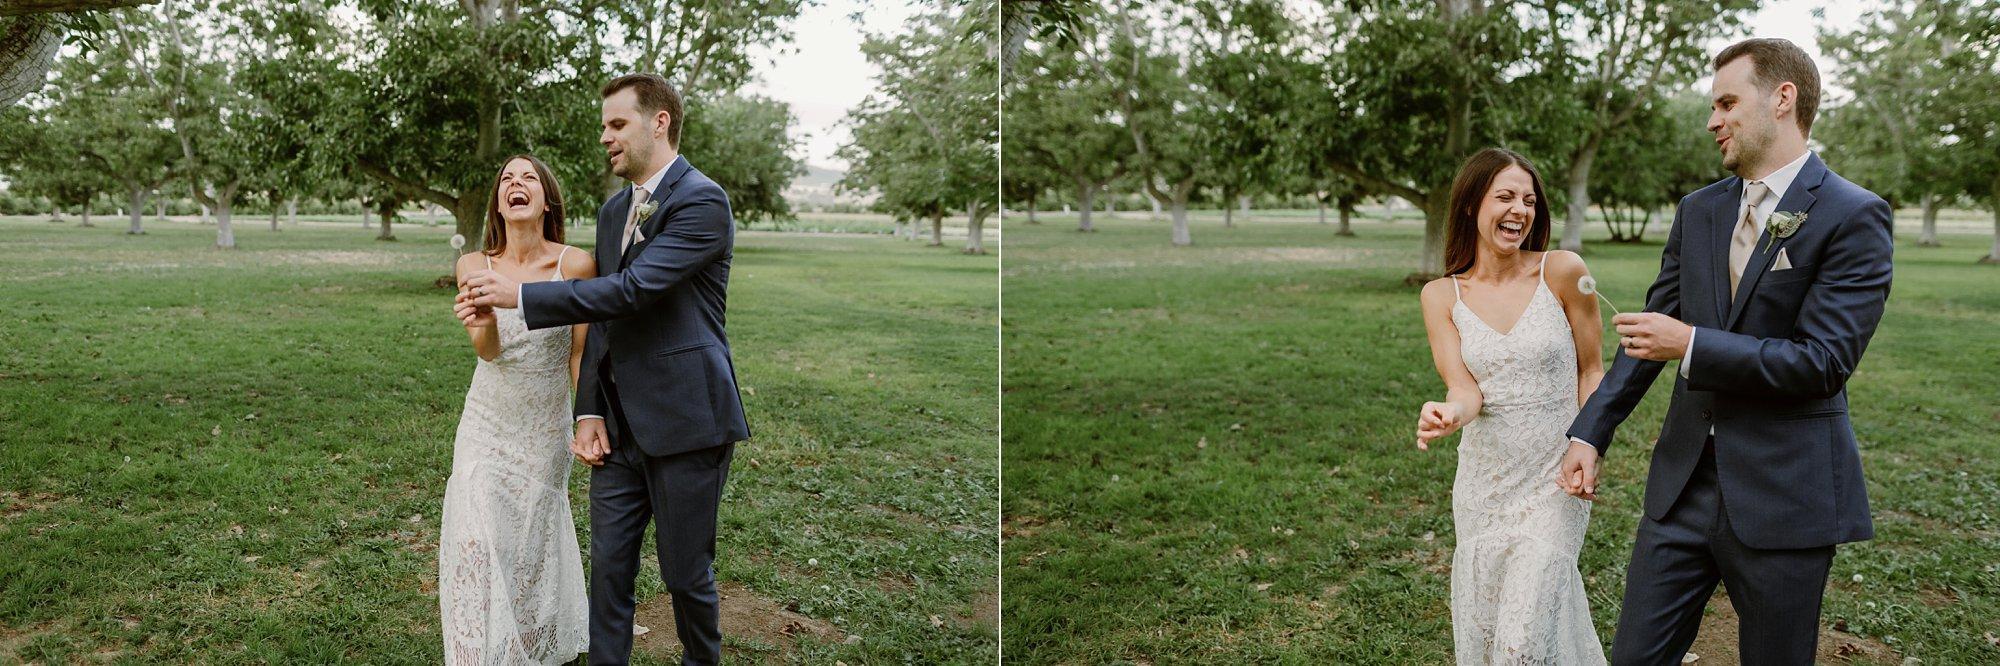 Walnut Grove Moorpark California Wedding_0056.jpg